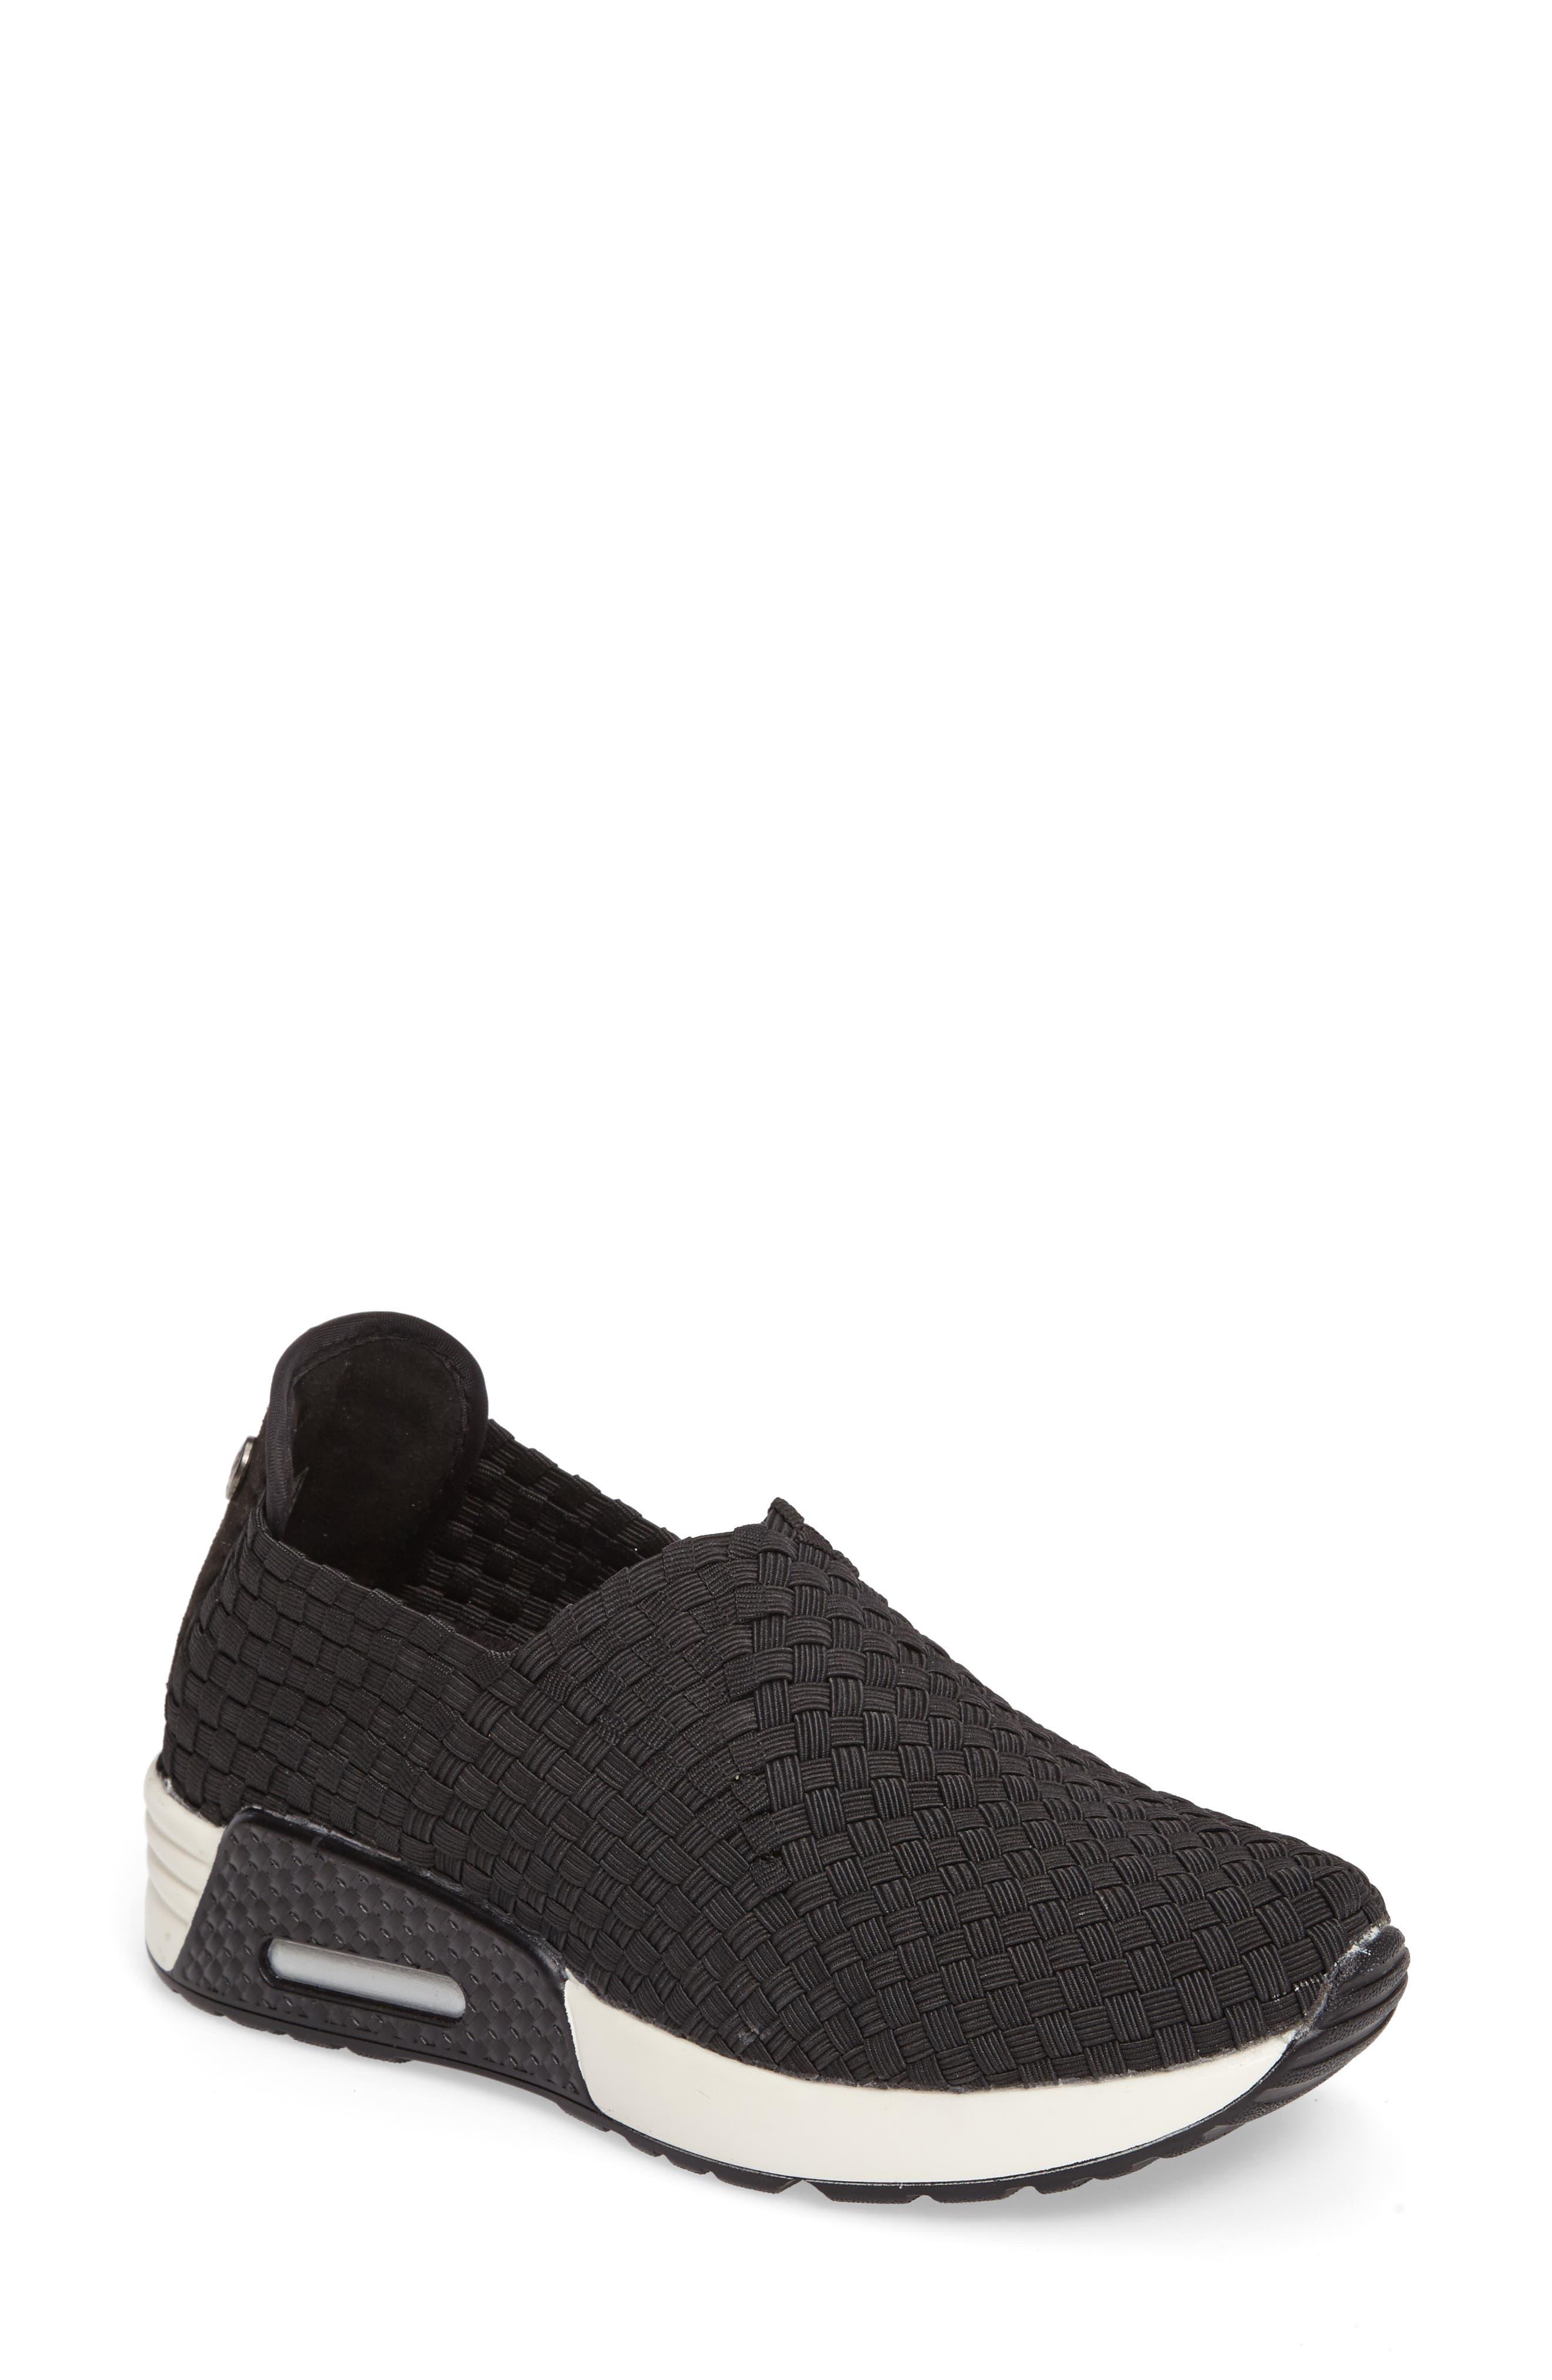 BERNIE MEV. Best Gem Woven Elastic Sneaker